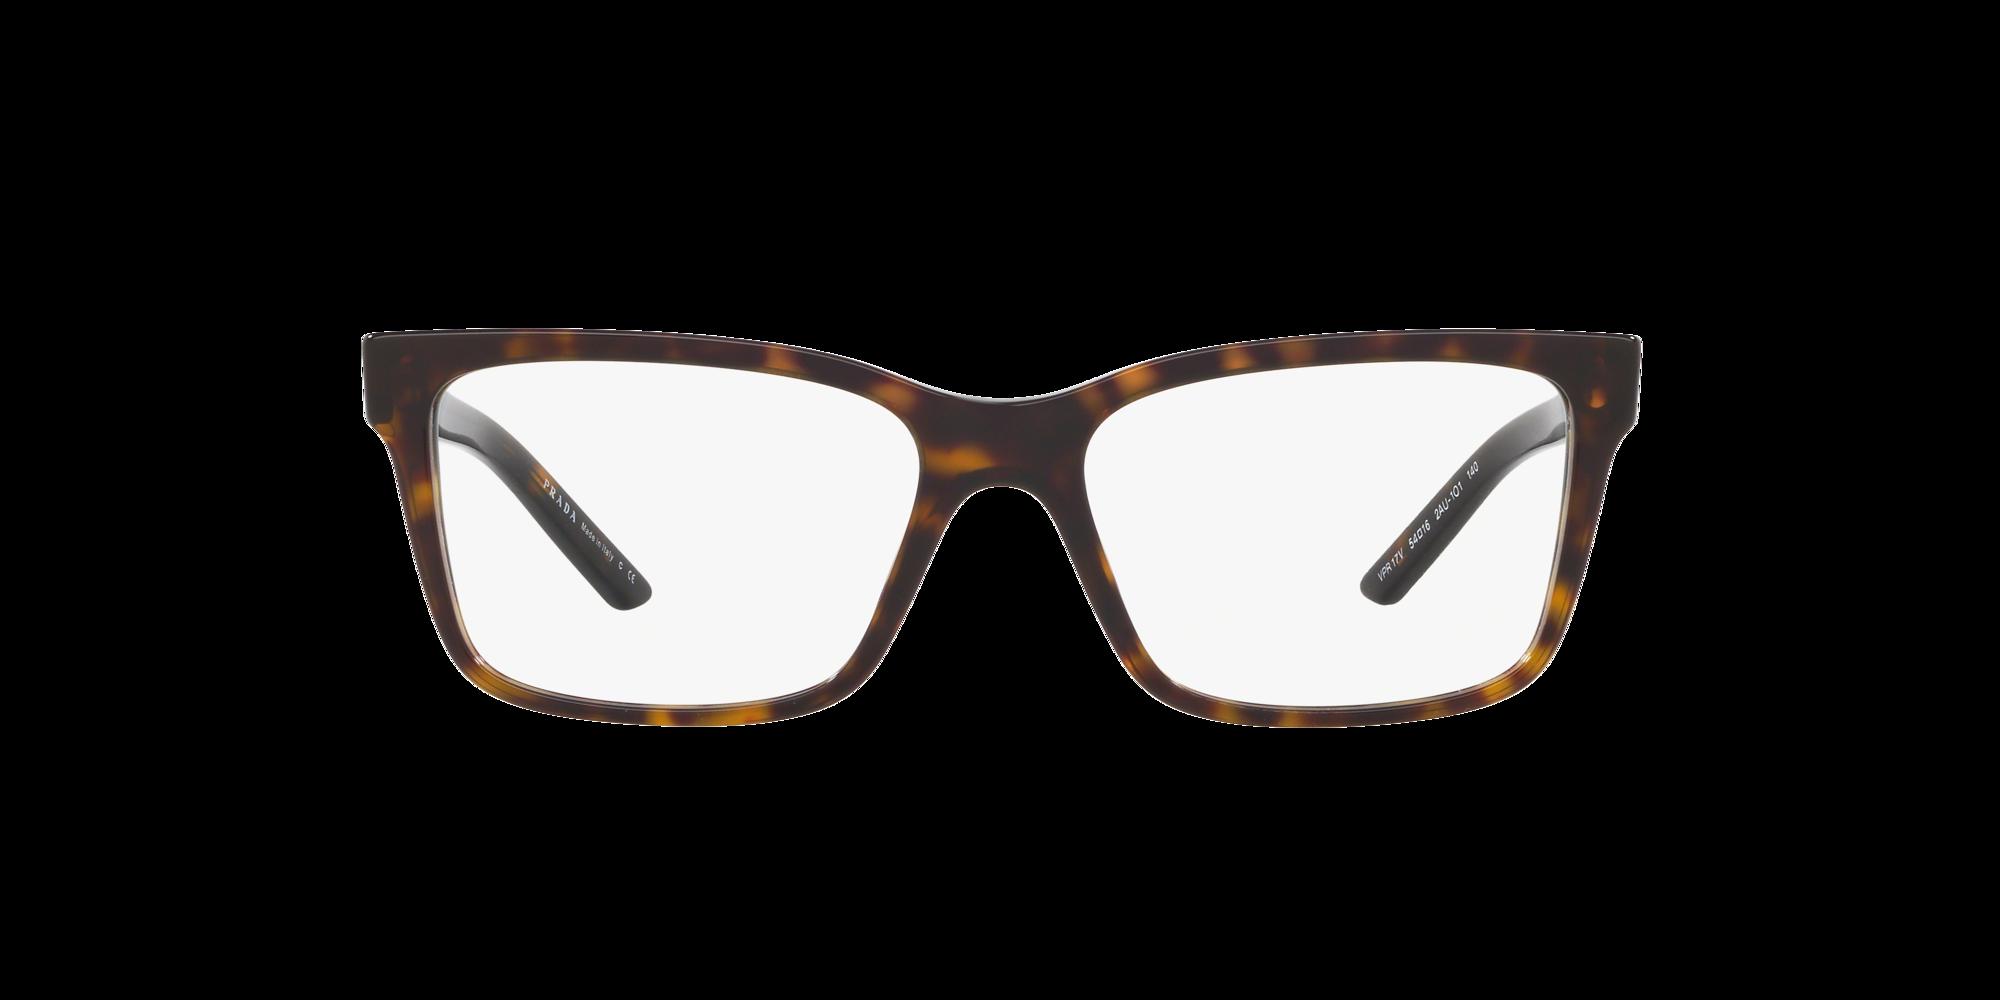 Image for PR 17VV MILLENNIALS from LensCrafters | Glasses, Prescription Glasses Online, Eyewear